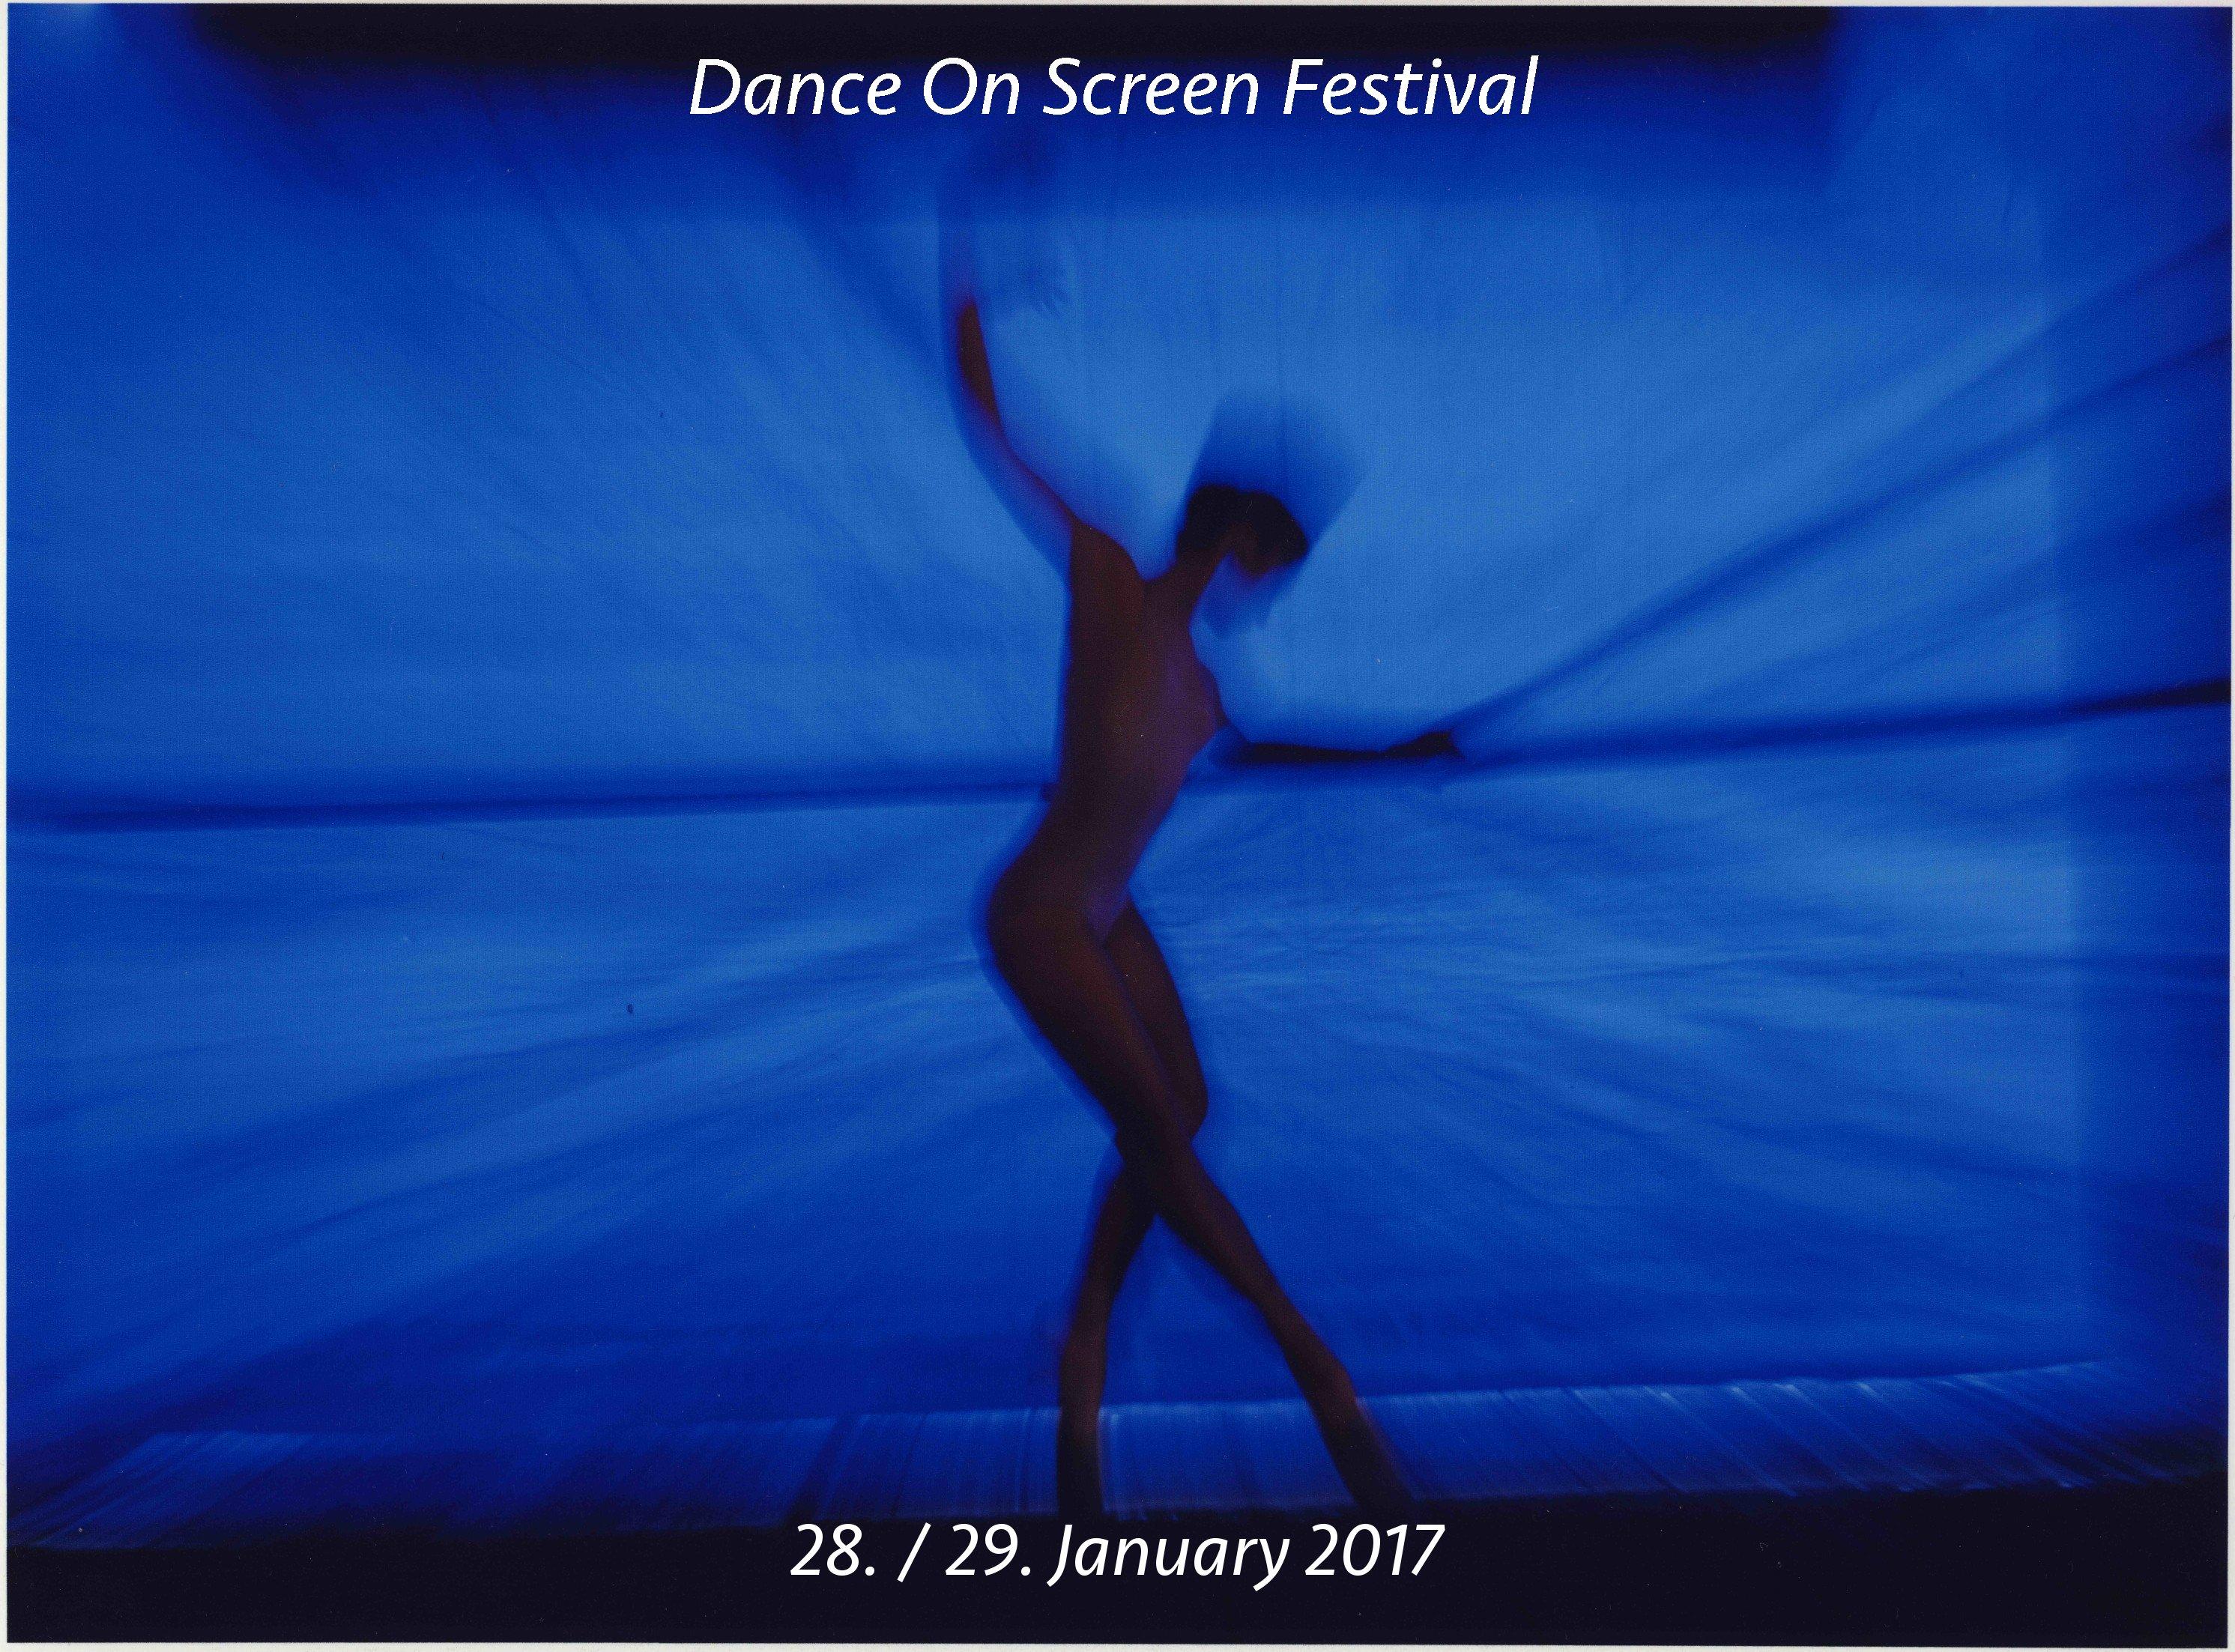 ValentinaMoar.com Dance On Screen 2nd Edition 2017 - Submission Deadline: 27 Dec 2016